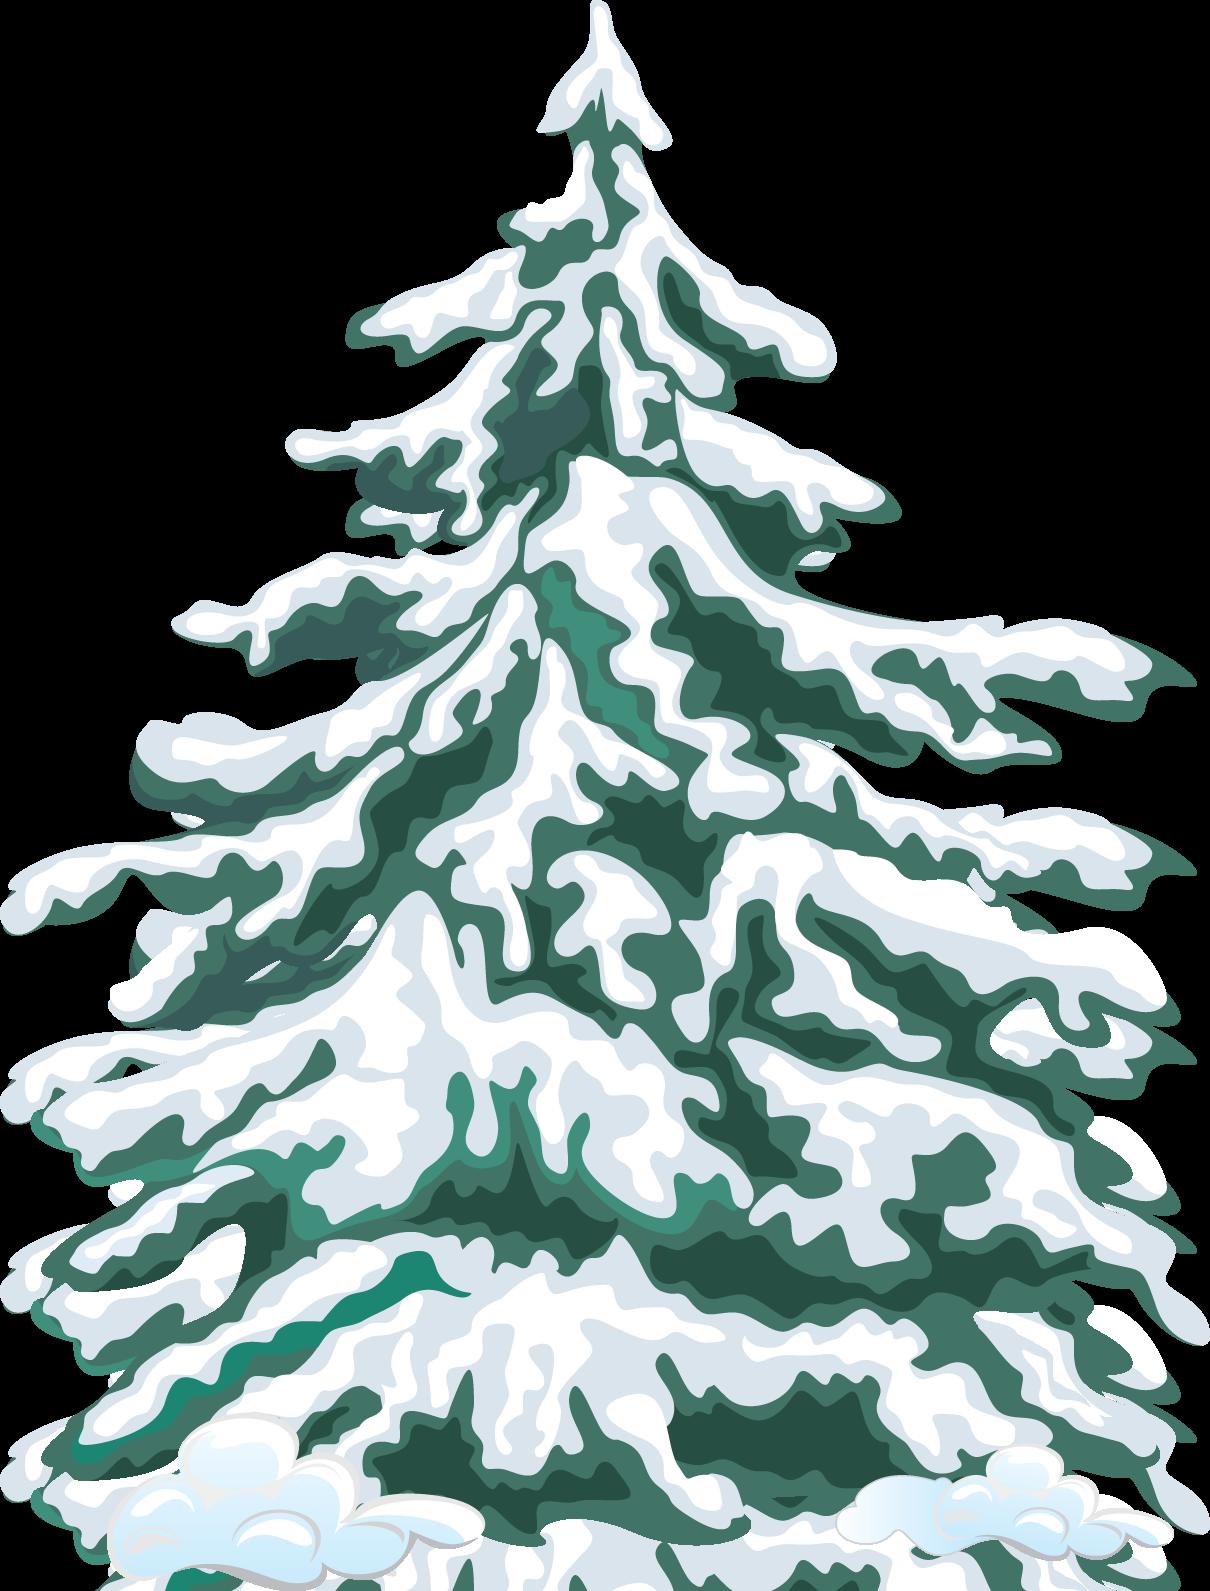 Creative Clip Art Of Trees.